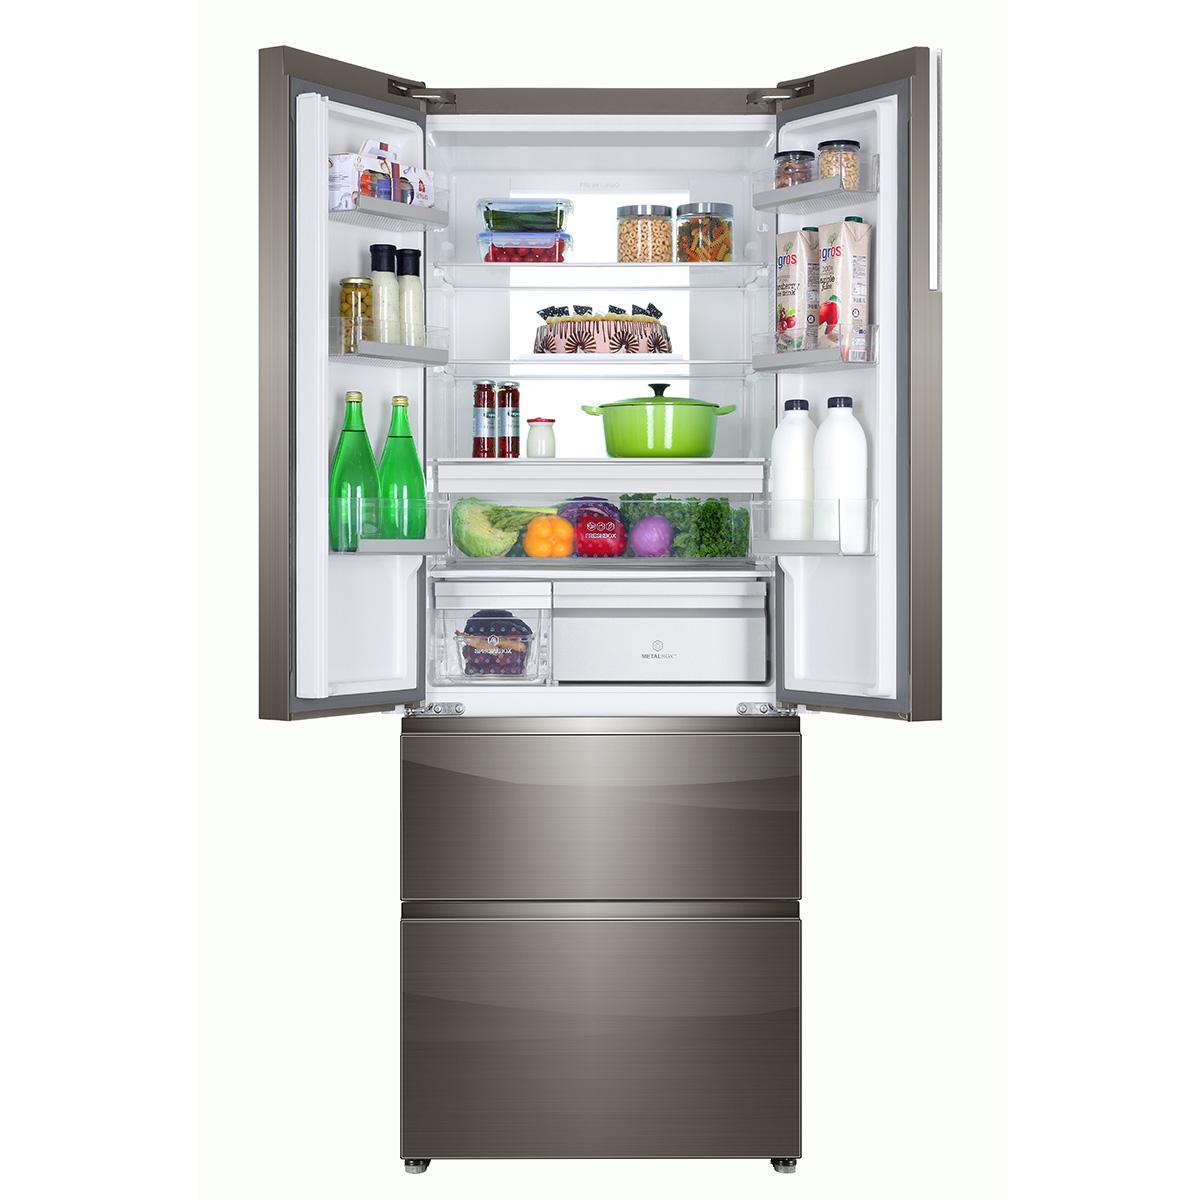 Casarte/卡萨帝                         冰箱                         BCD-465WDCHU1